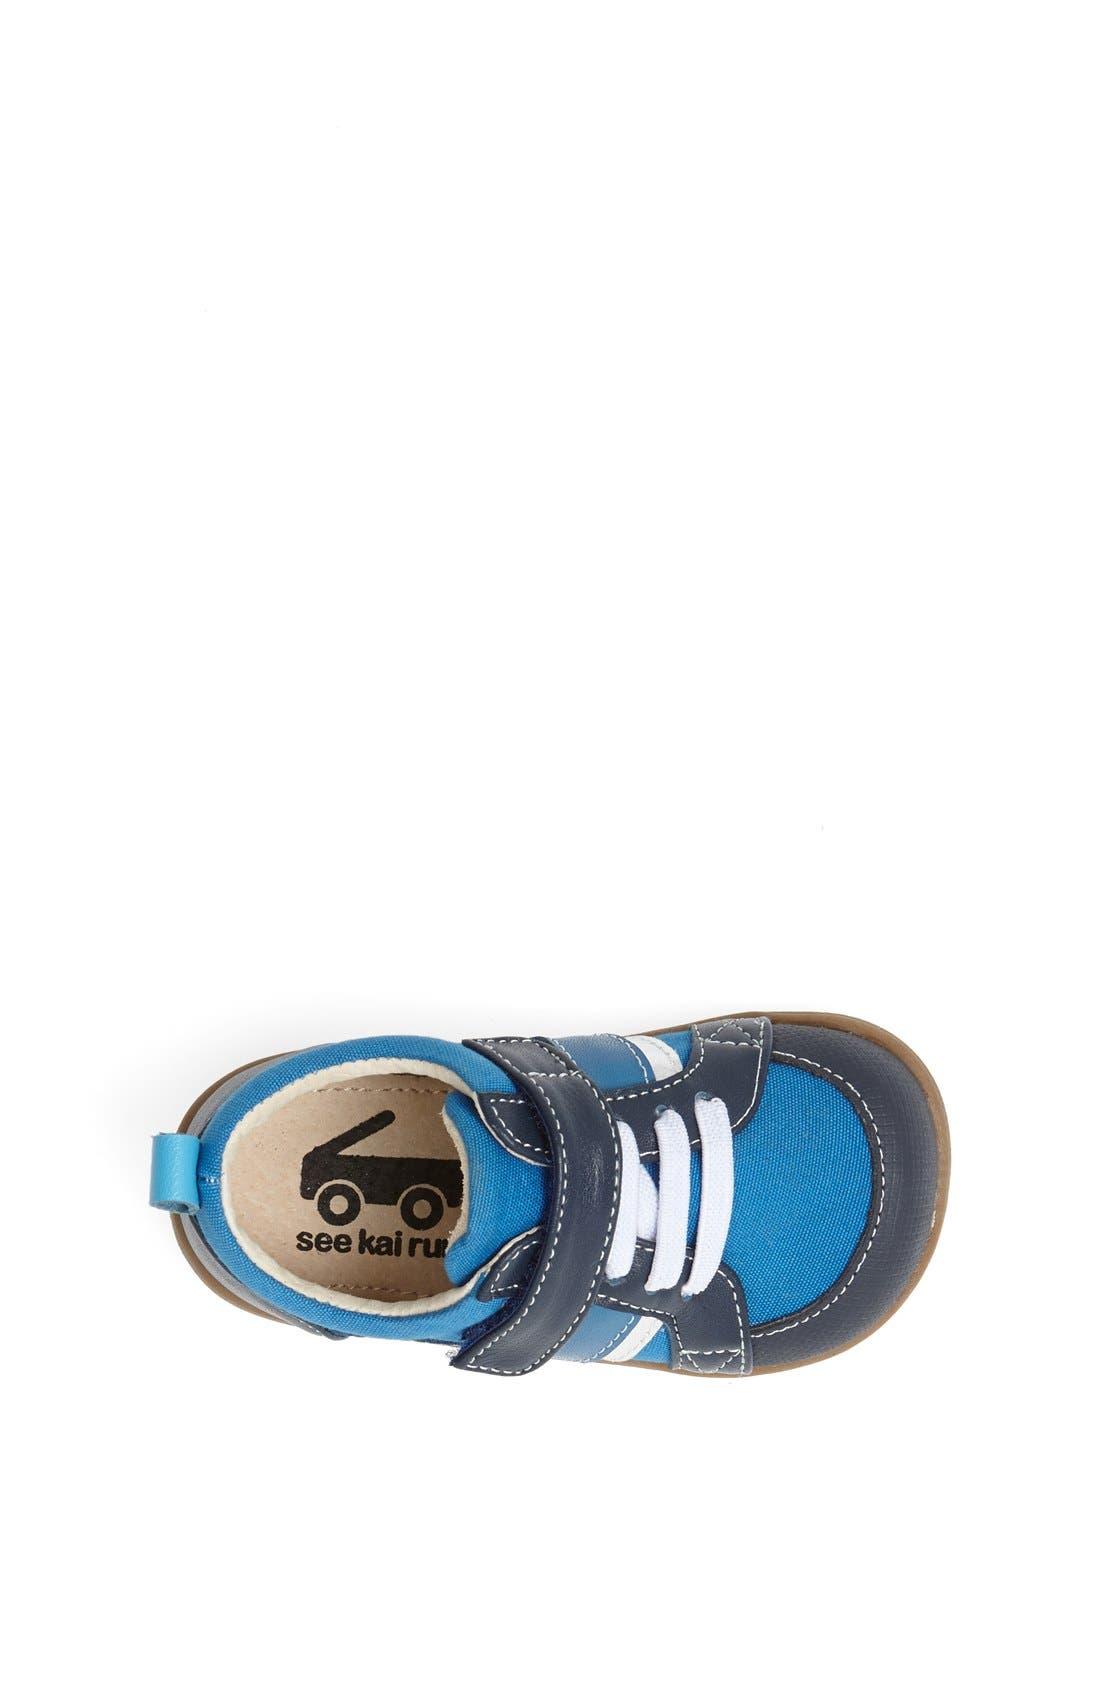 Alternate Image 3  - See Kai Run 'Cash' Sneaker (Baby & Walker)